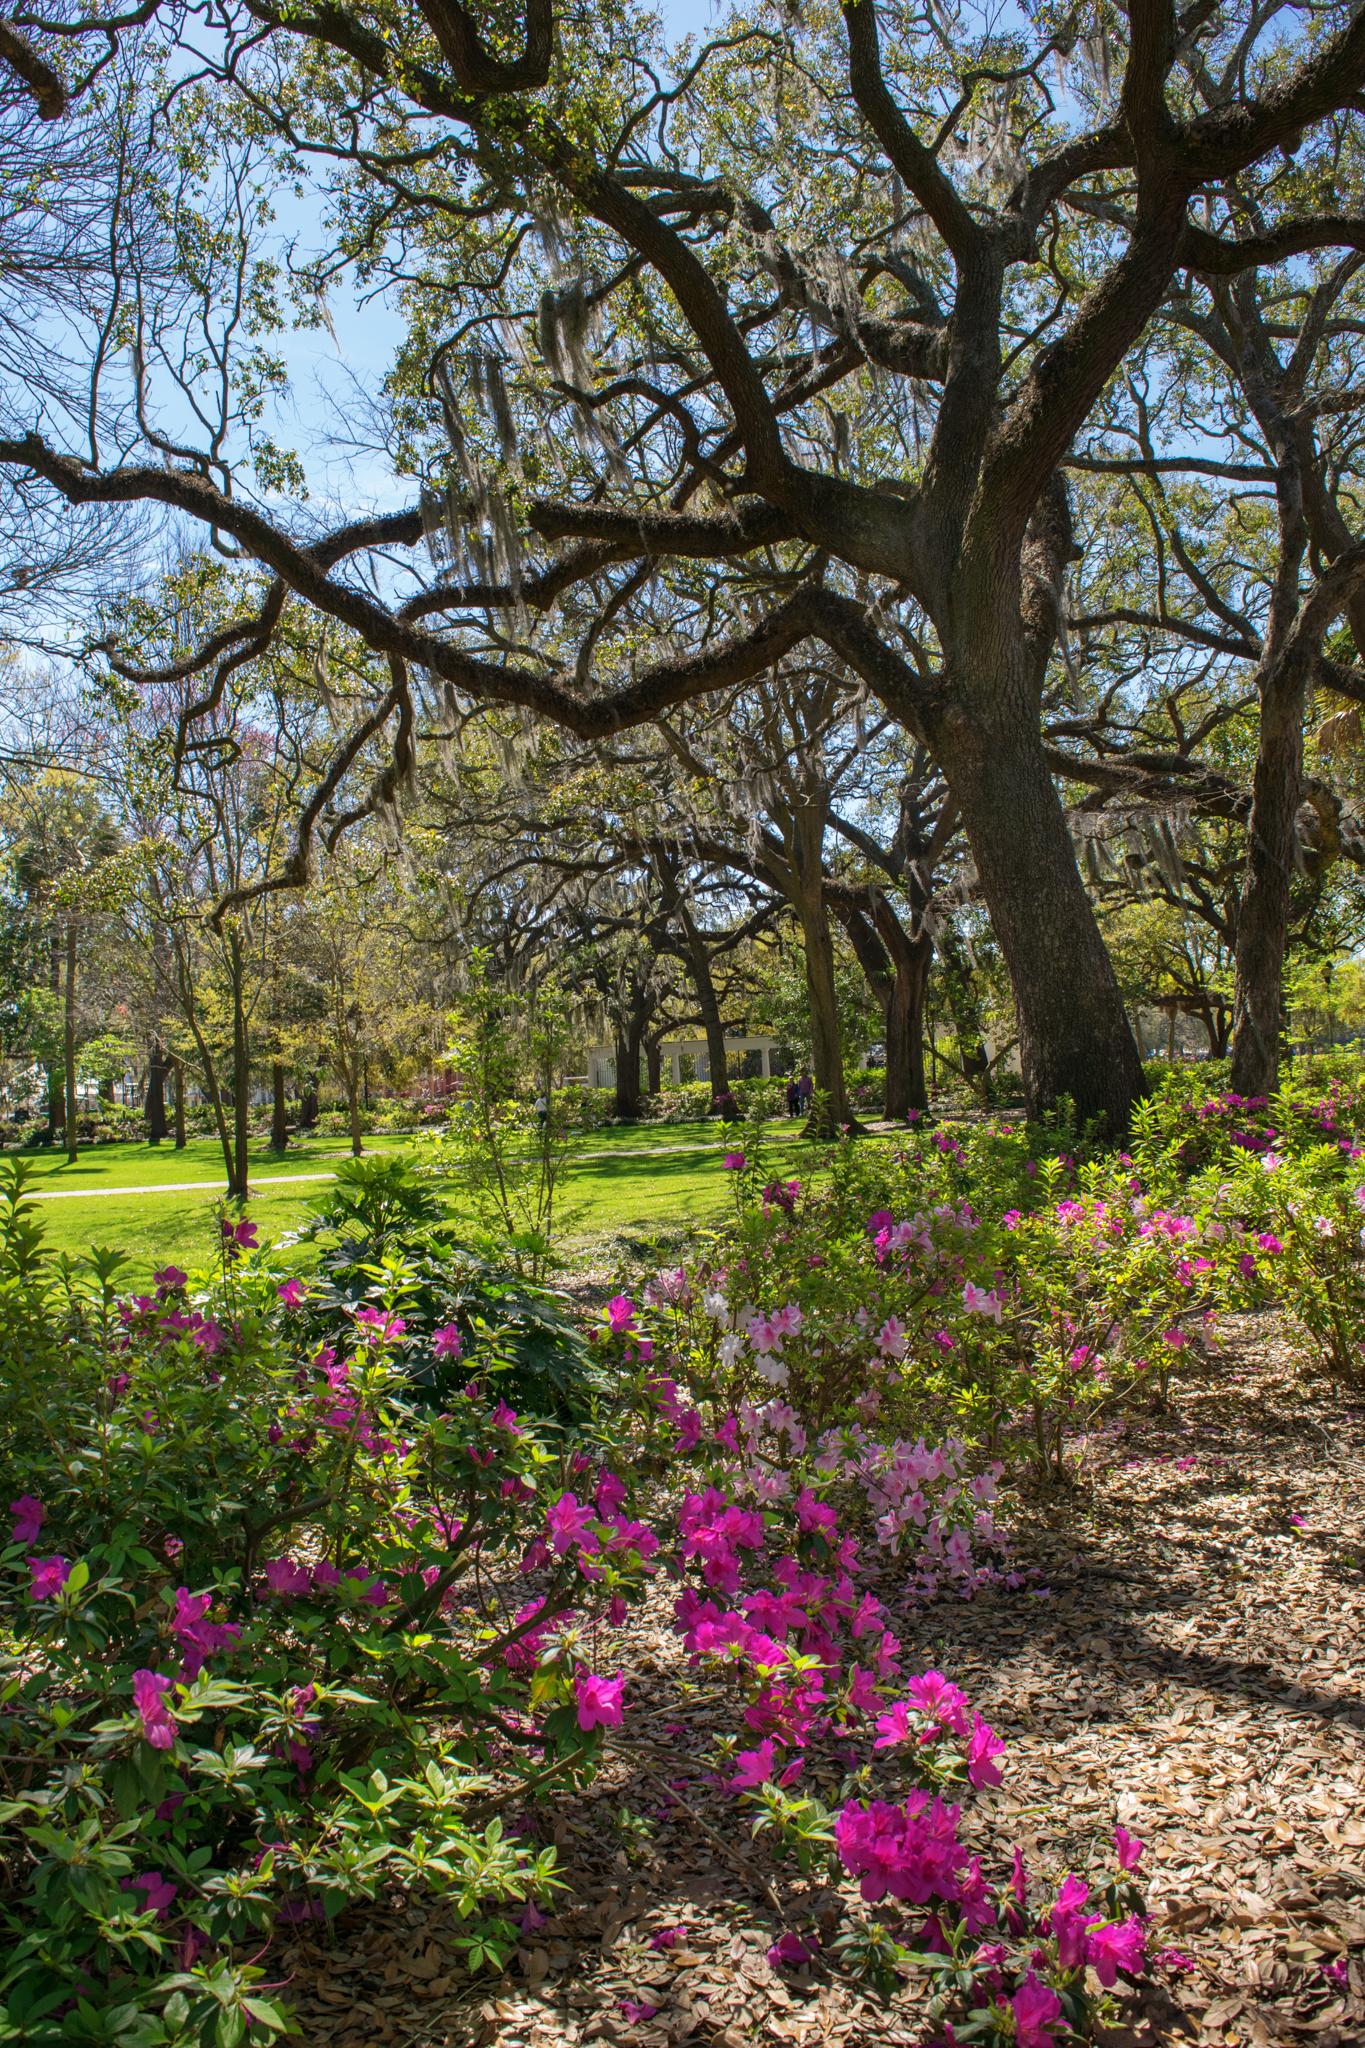 Springtime in Forsyth Park